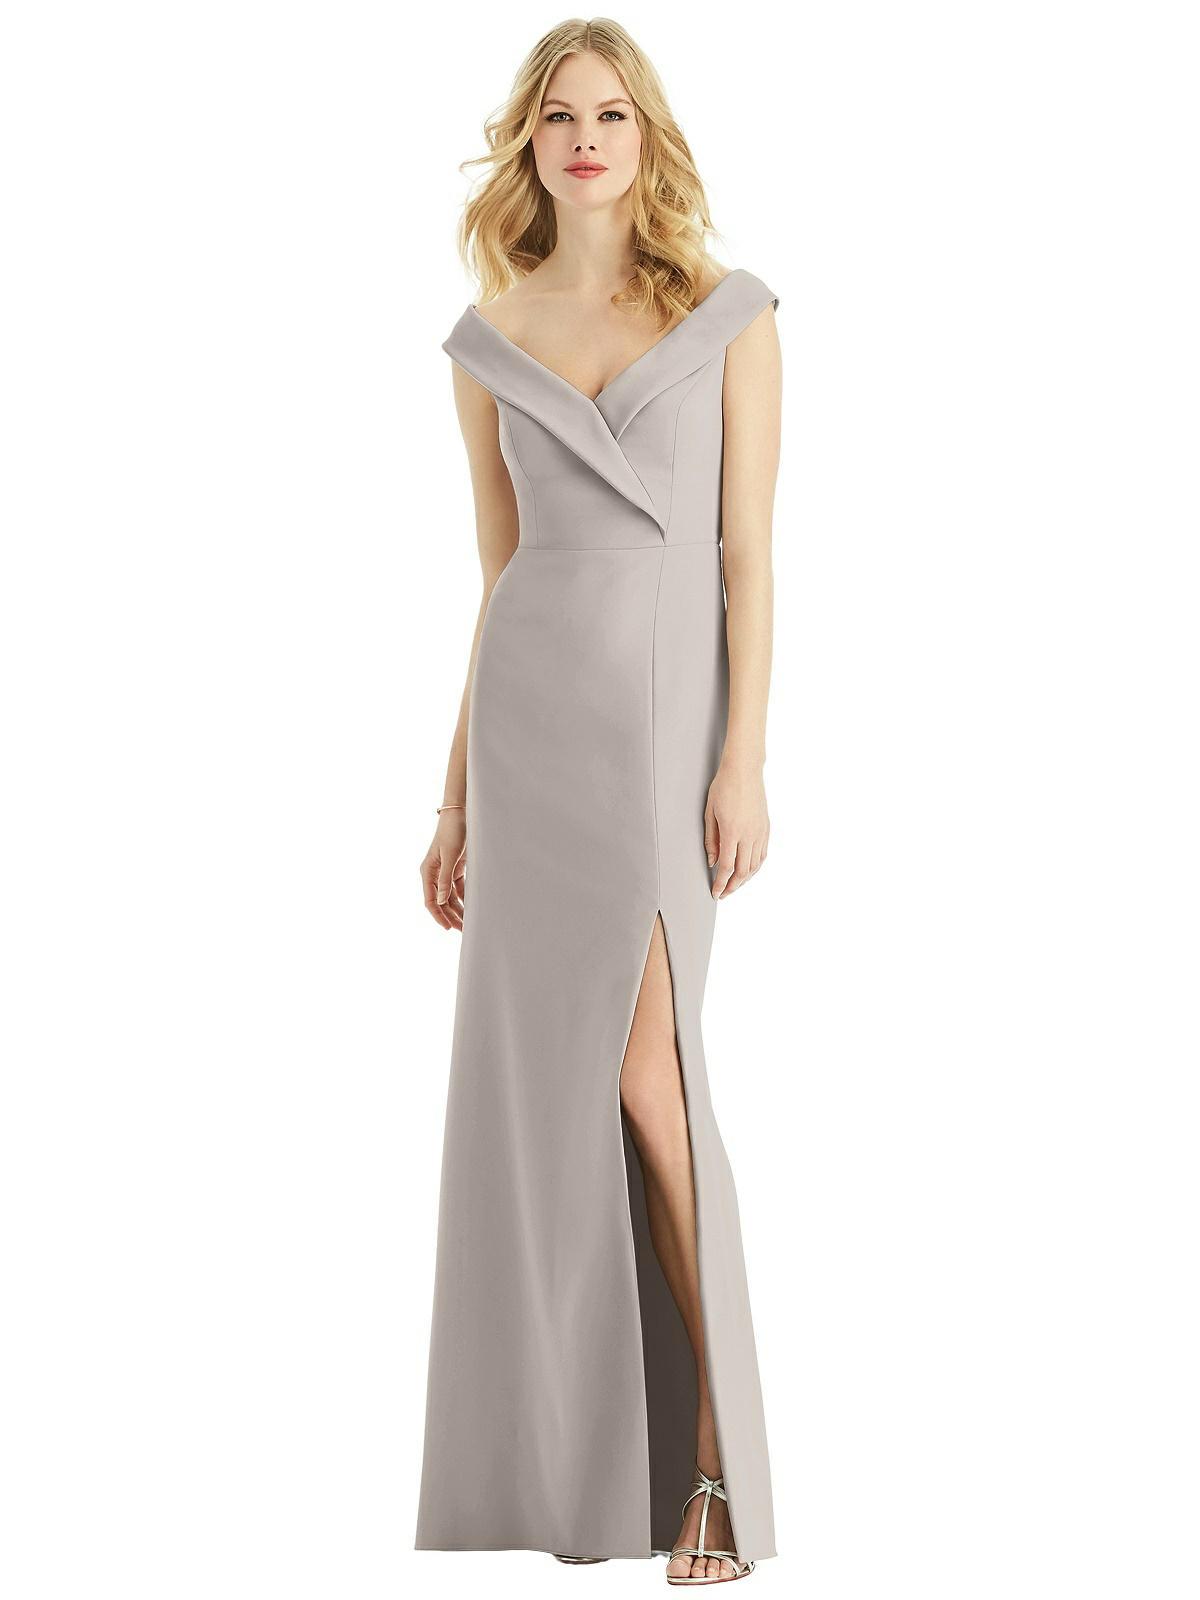 ee11b2c8ce Home · Bridesmaid Dresses · Bella Bridesmaids Dress BB112. ○  ○